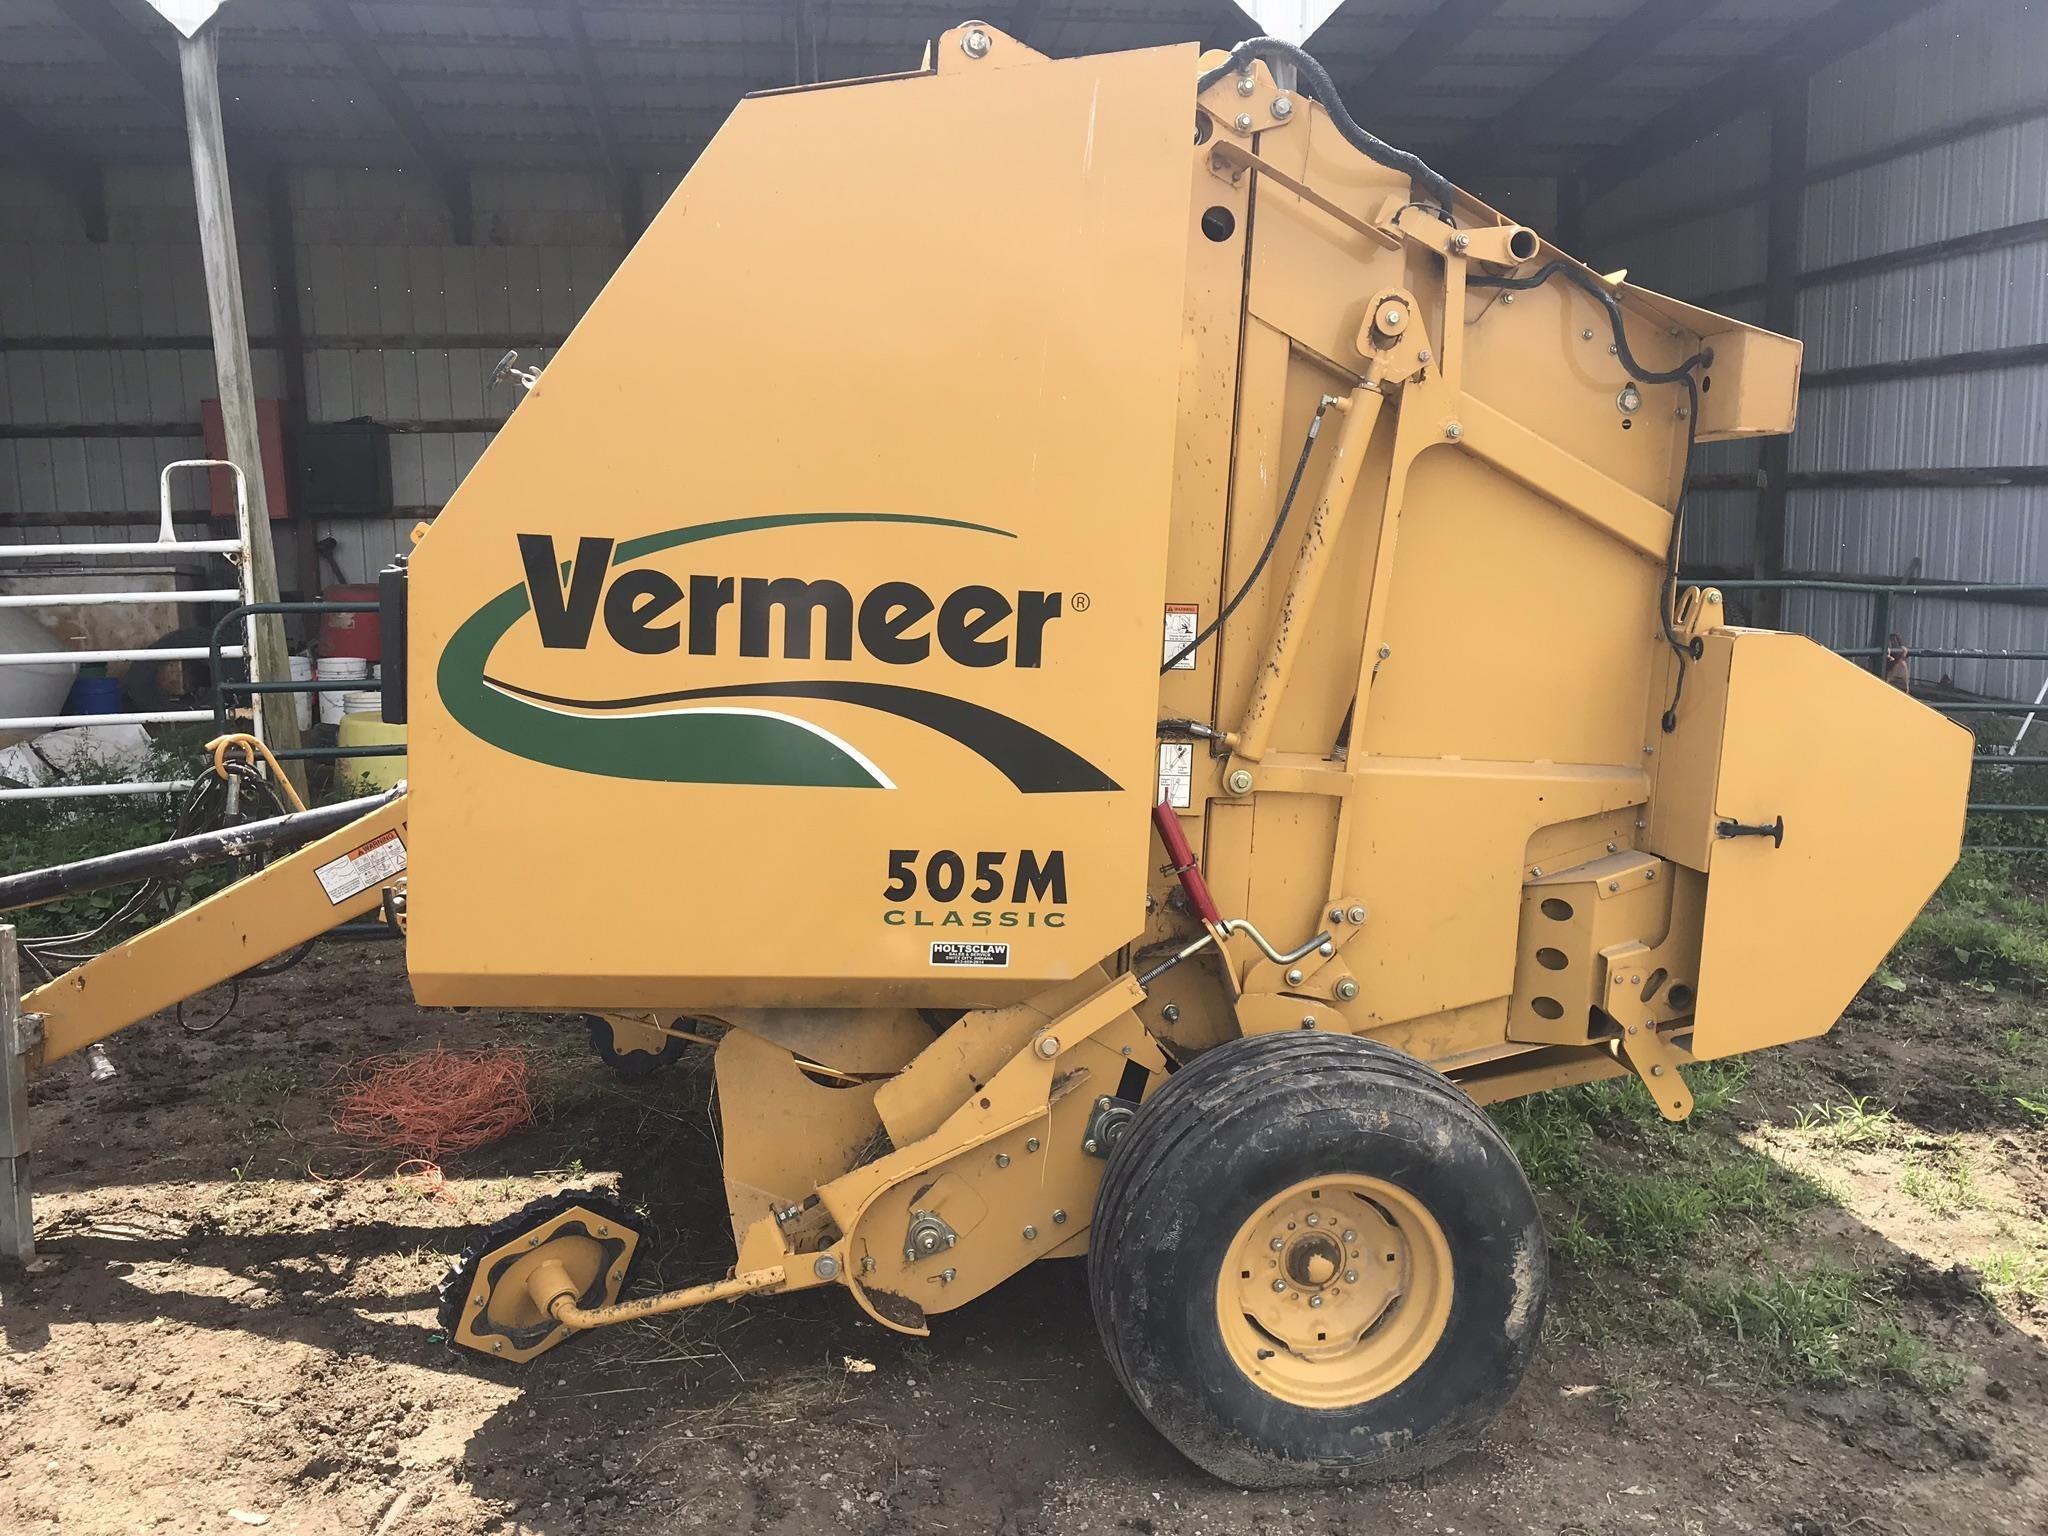 Vermeer 505M Classic Round Baler